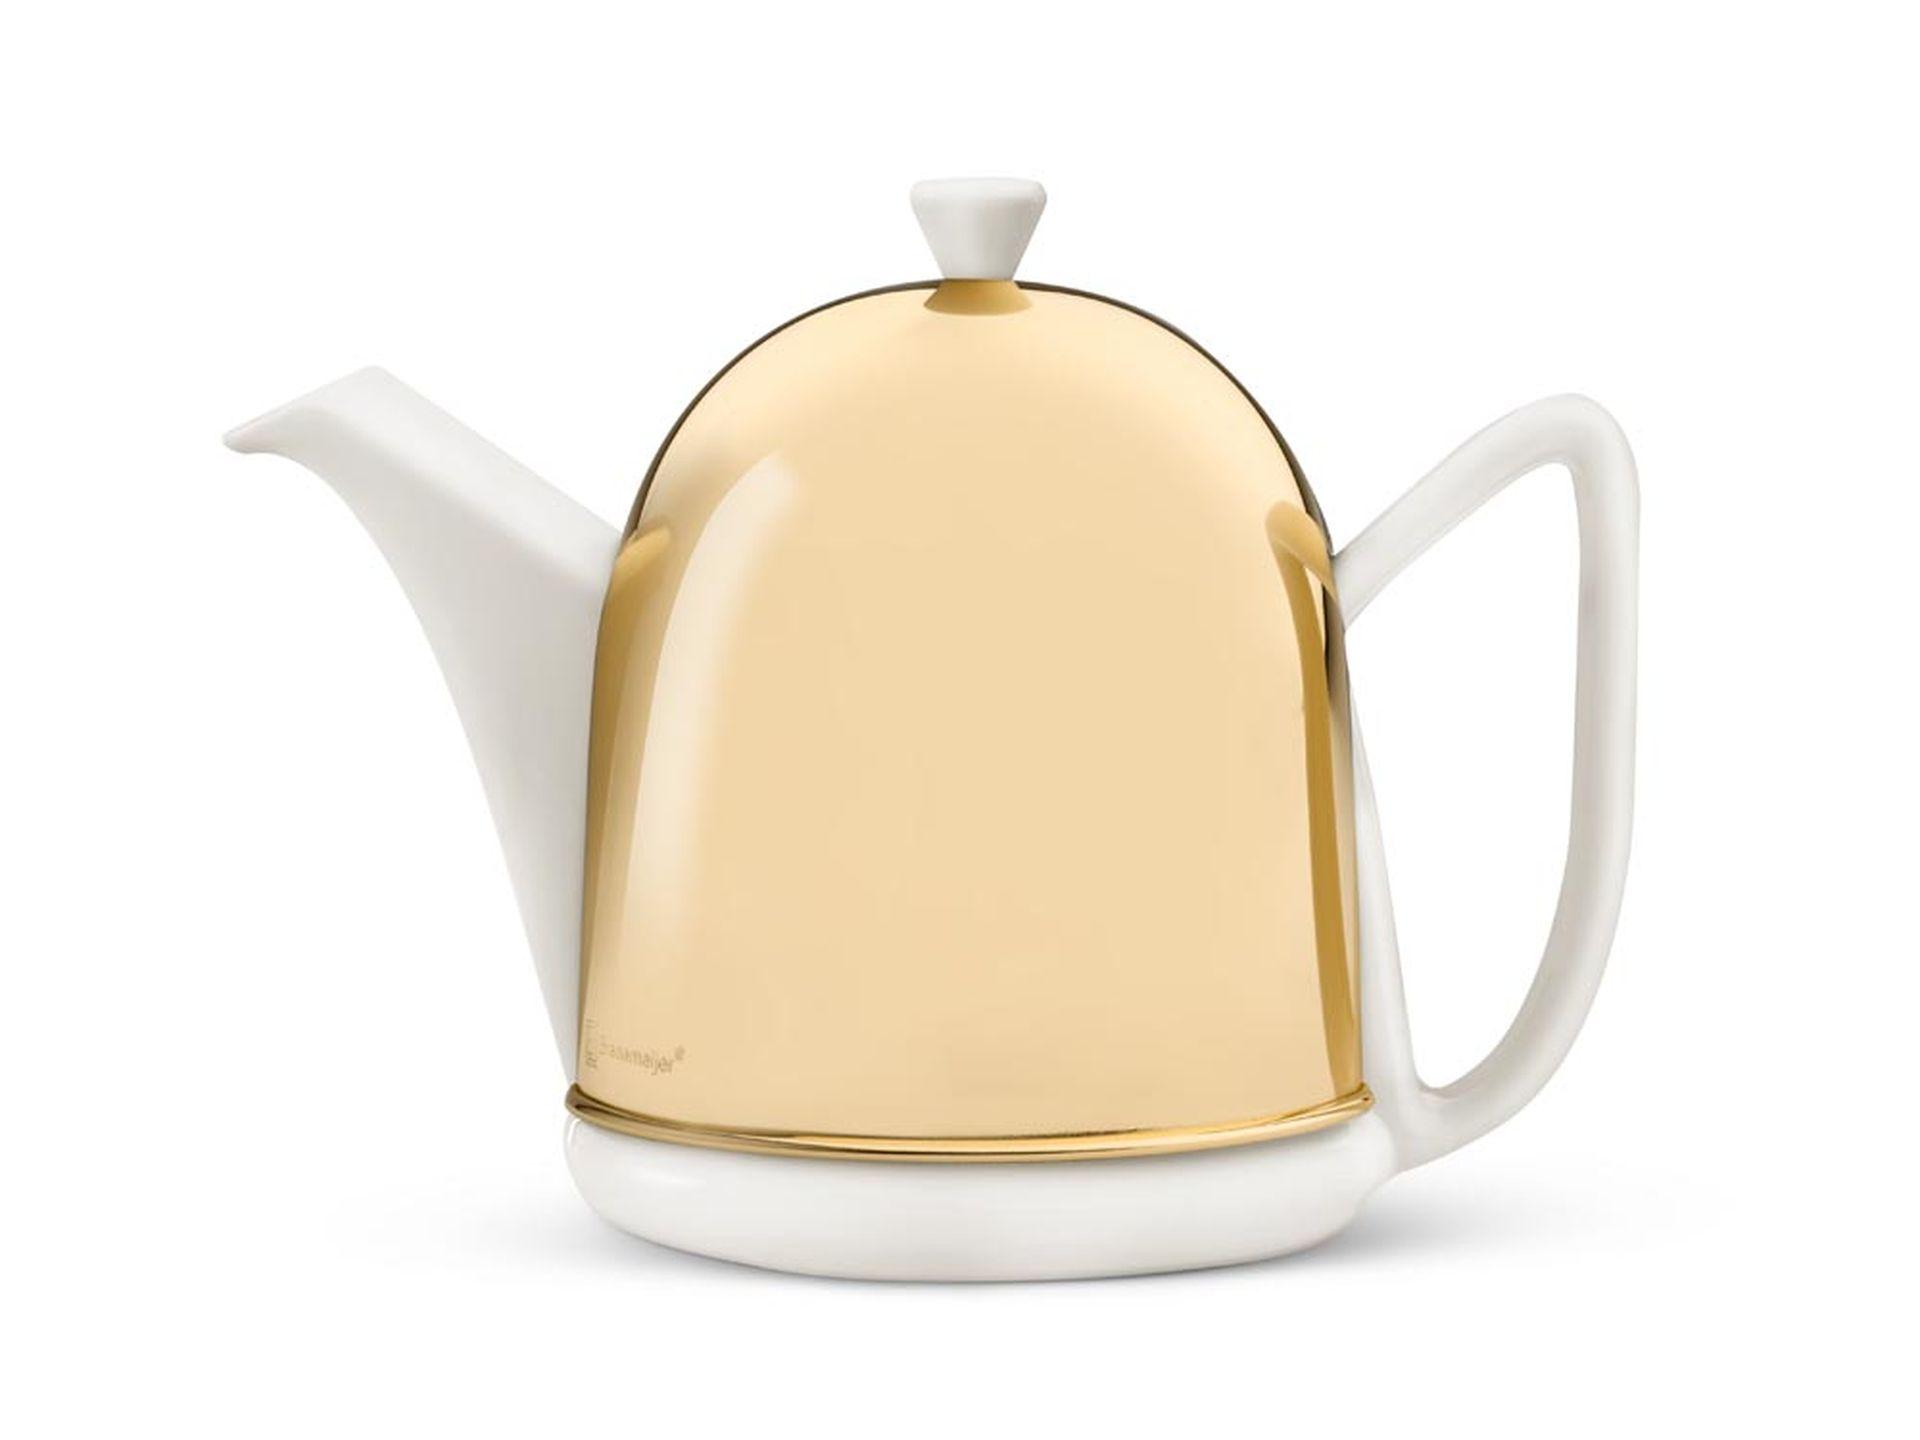 Bredemeijer Teekanne Cosy Manto 1,0 l Messing Weiß